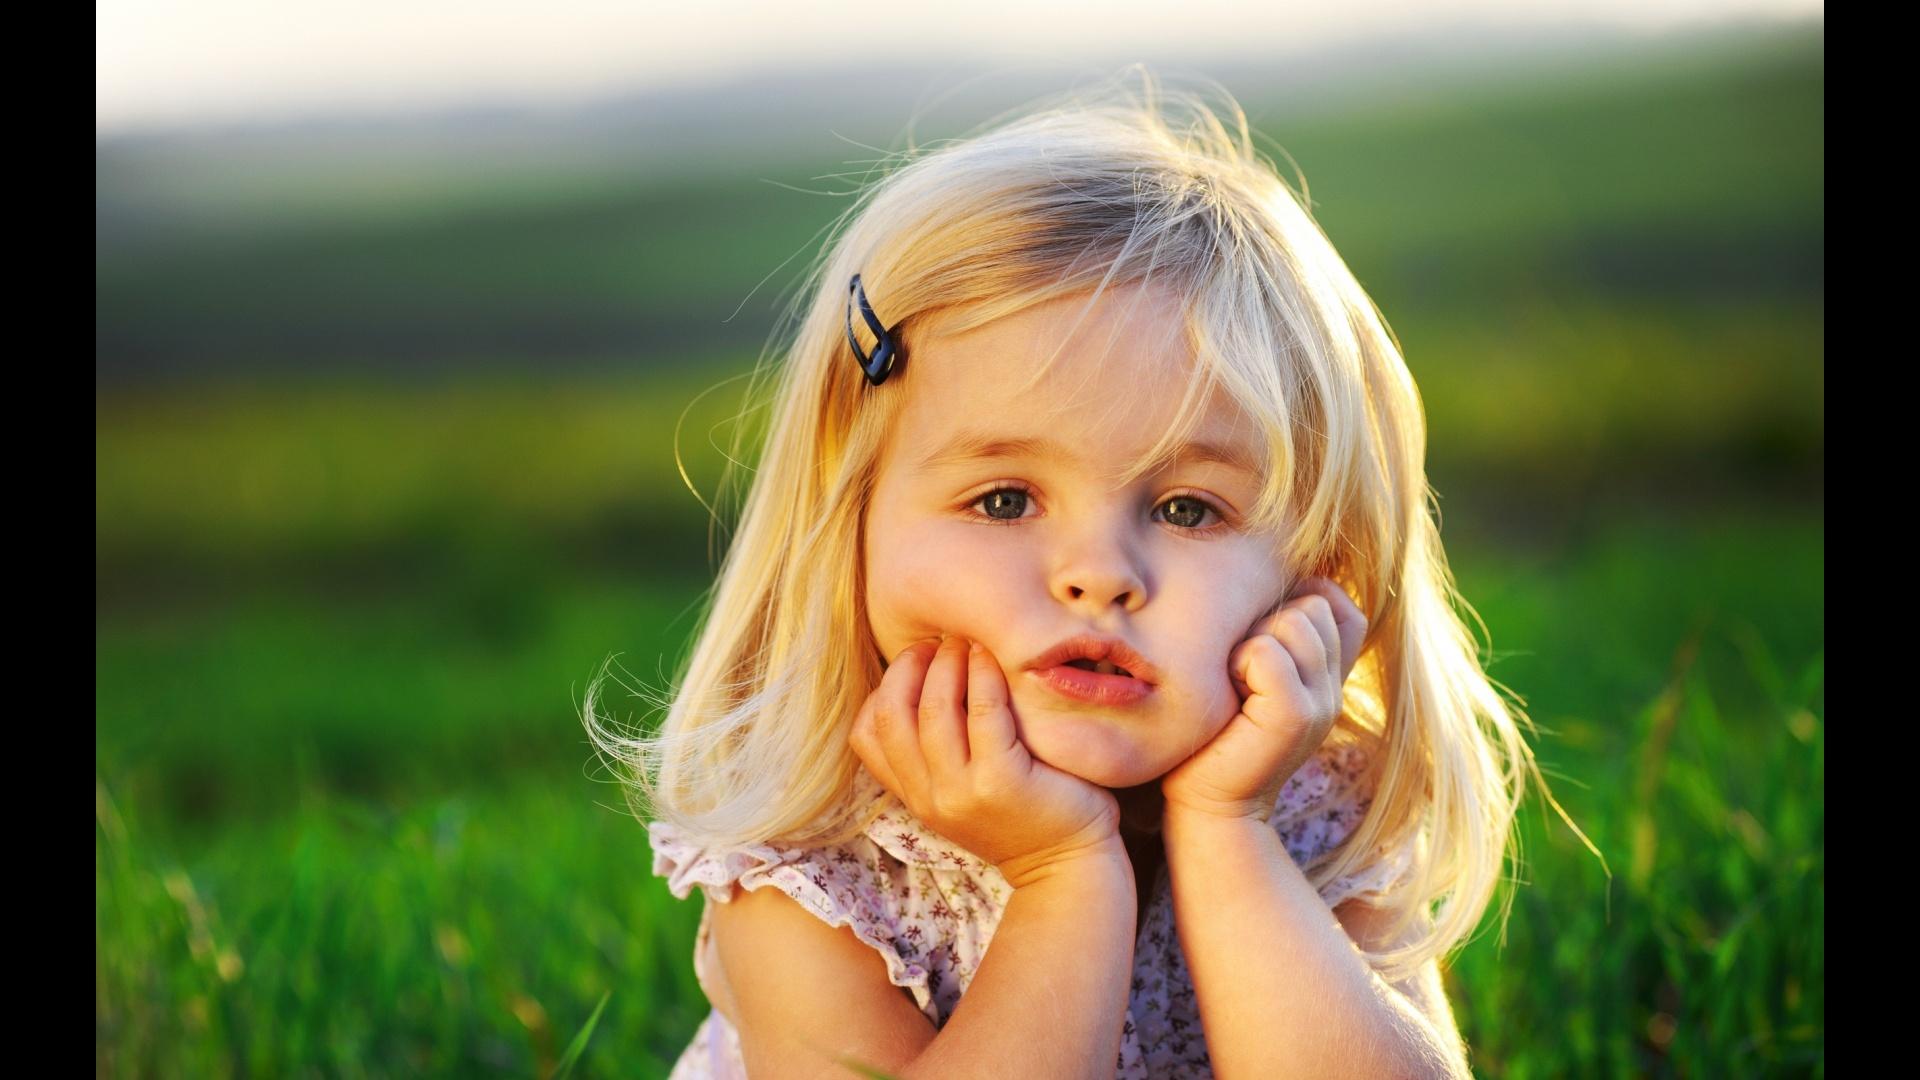 Cute-Little-Baby-Girl-Wallpaper